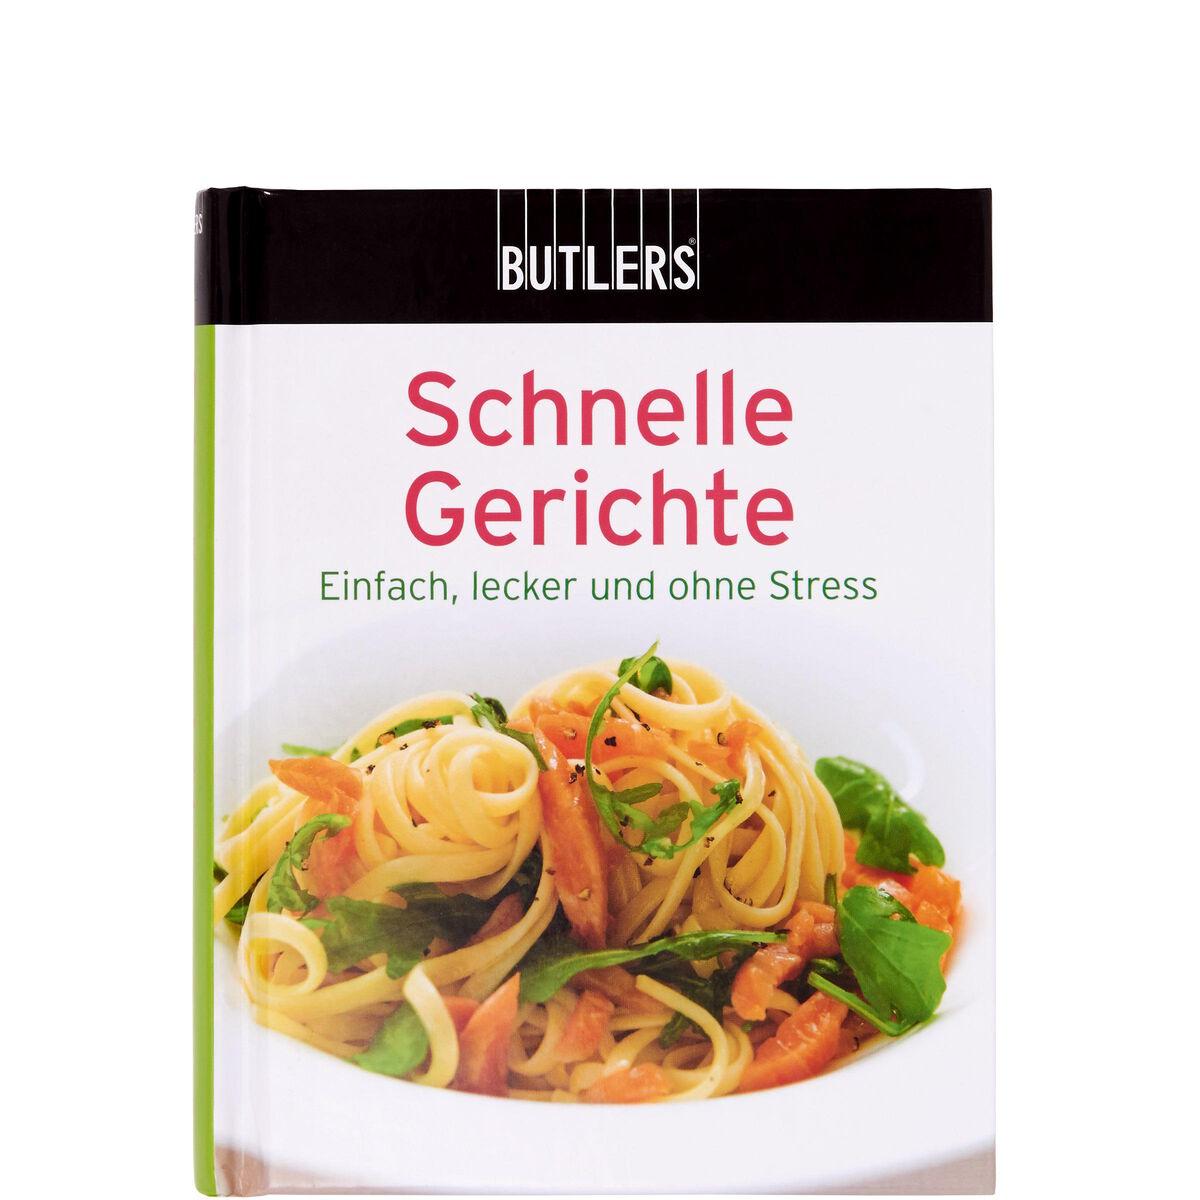 Kochbuch mini schnelle gerichte butlers for Schnelle gerichte buch